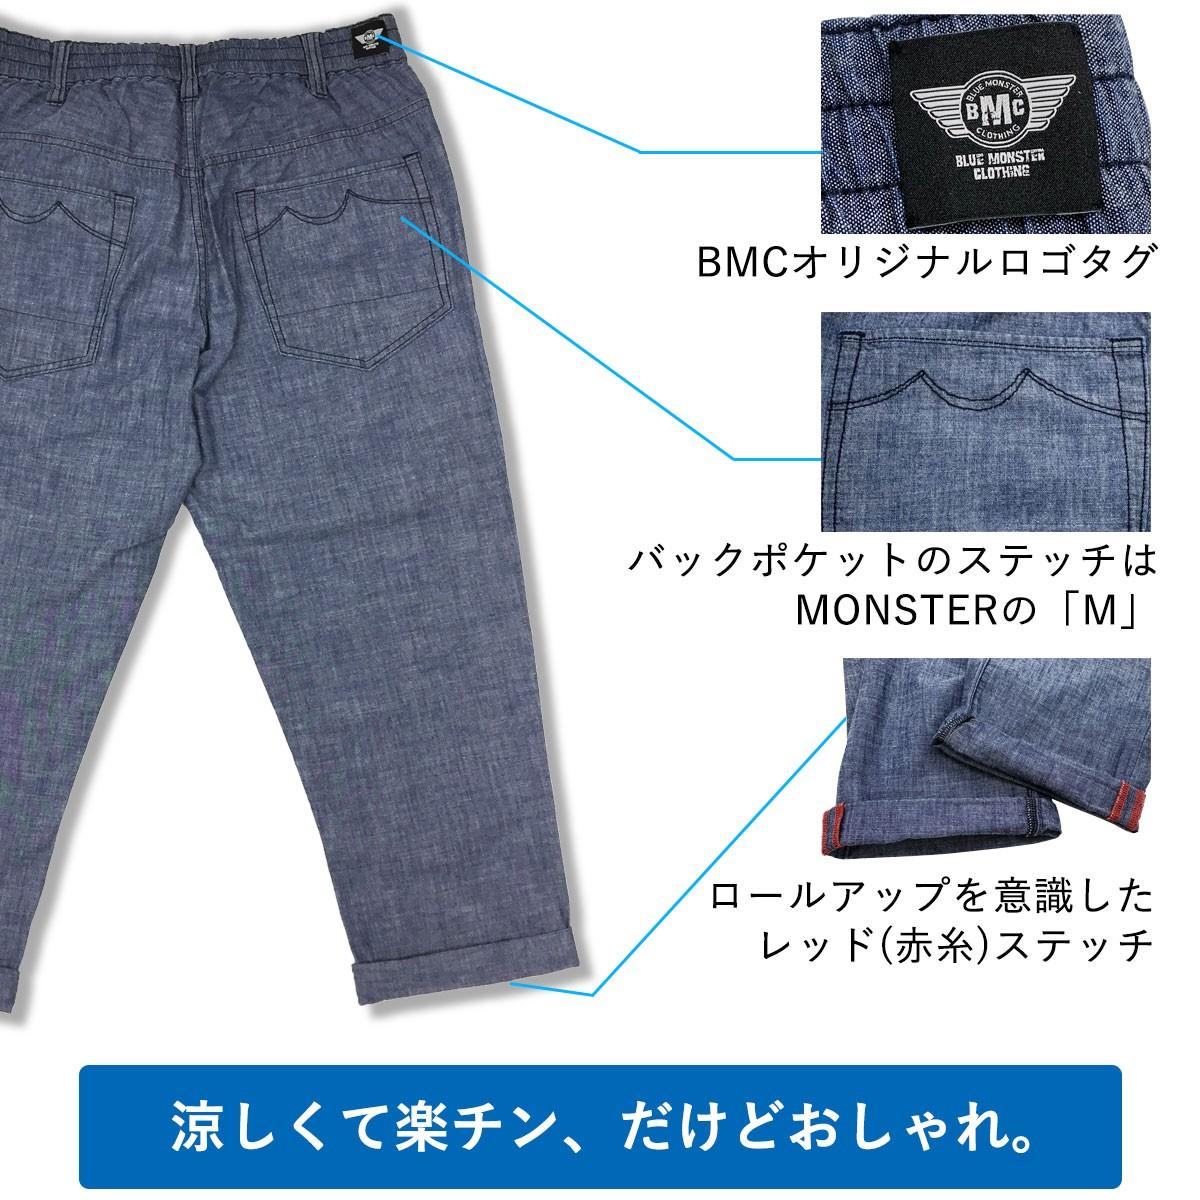 bmc夏涼しいイージーパンツ